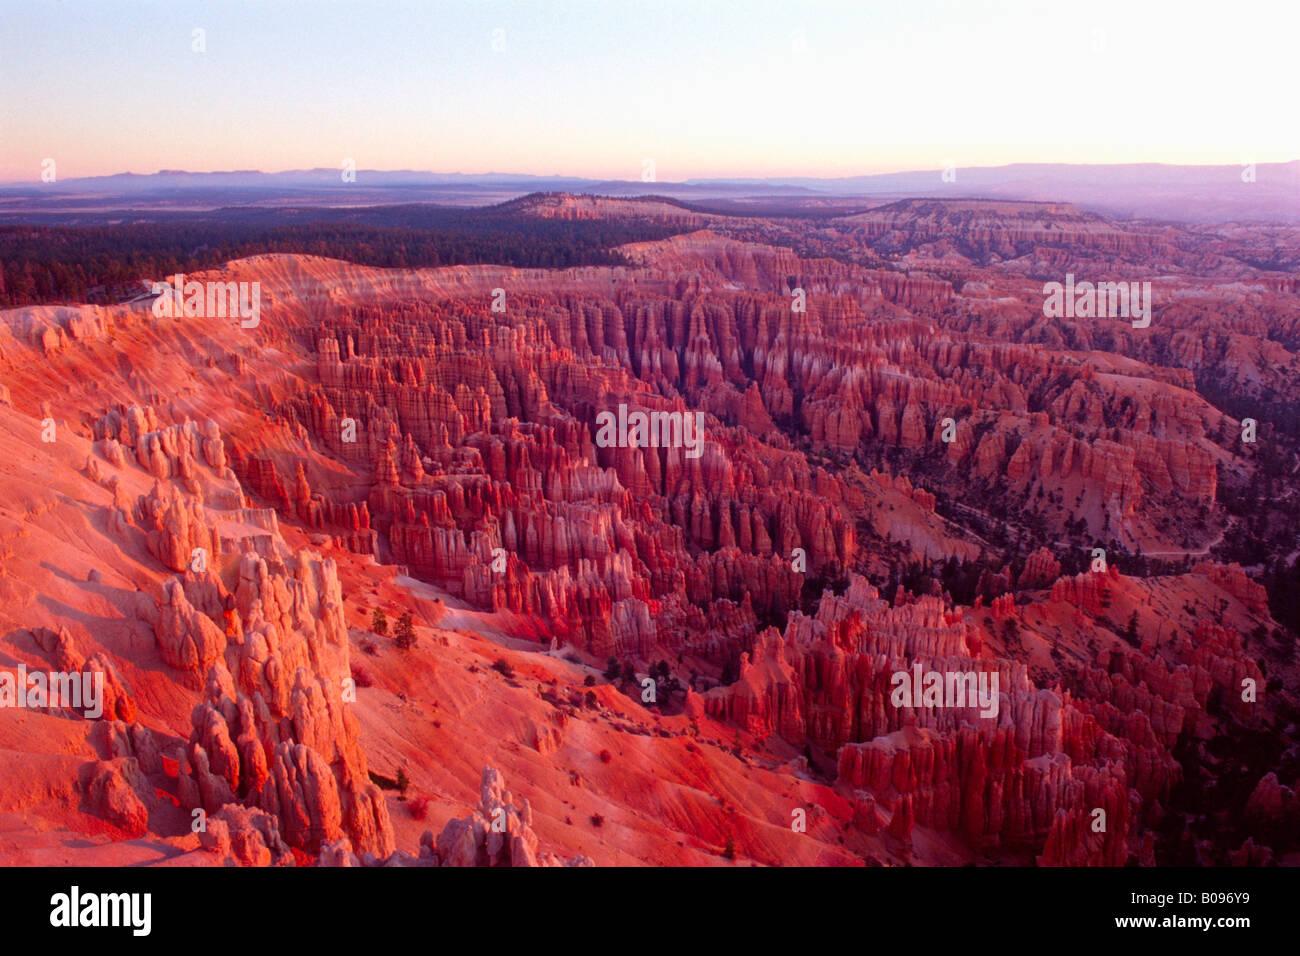 Amphitheater, Bryce Canyon National Park, Utah, USA - Stock Image